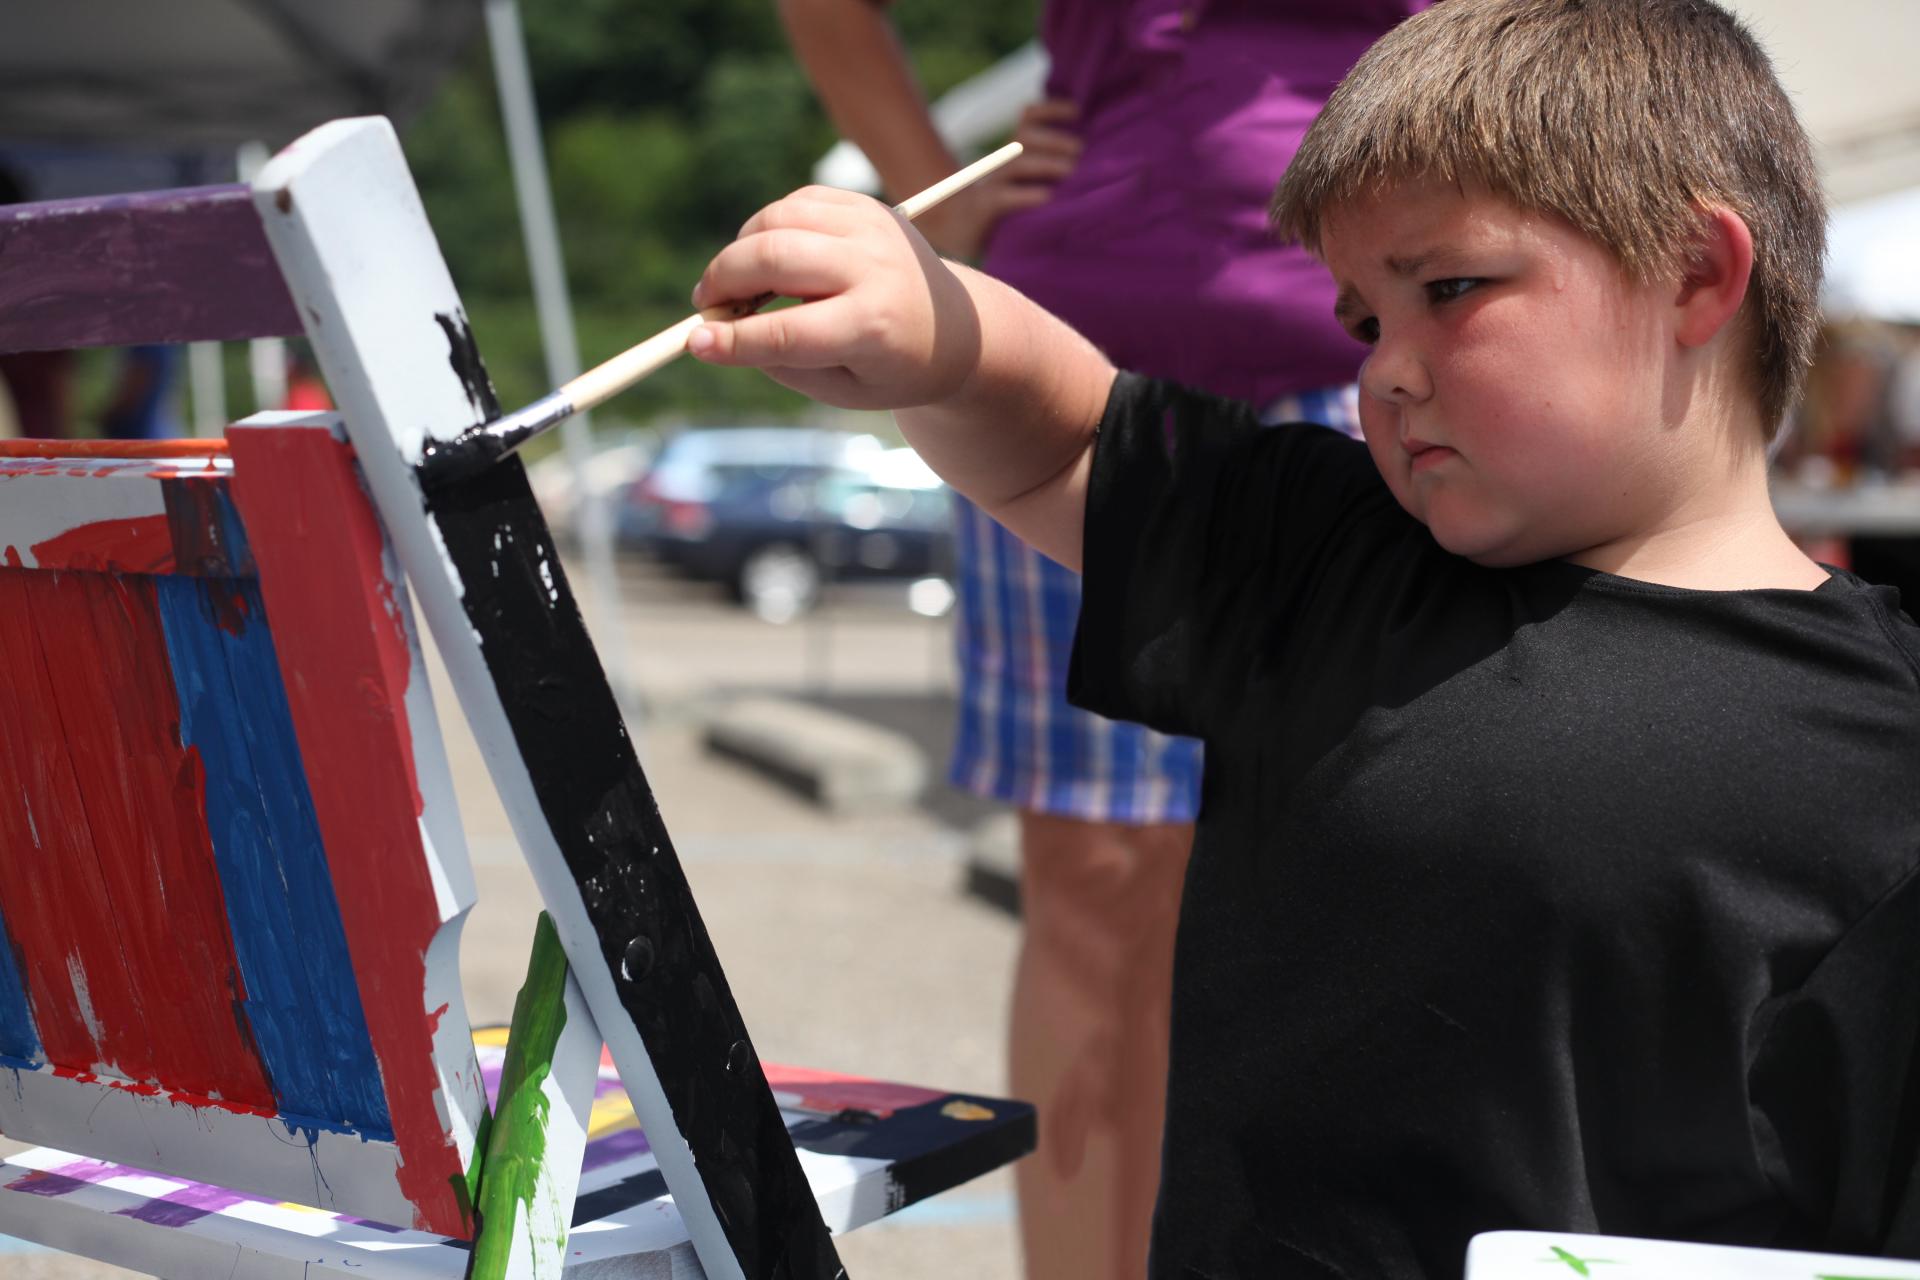 community children artists